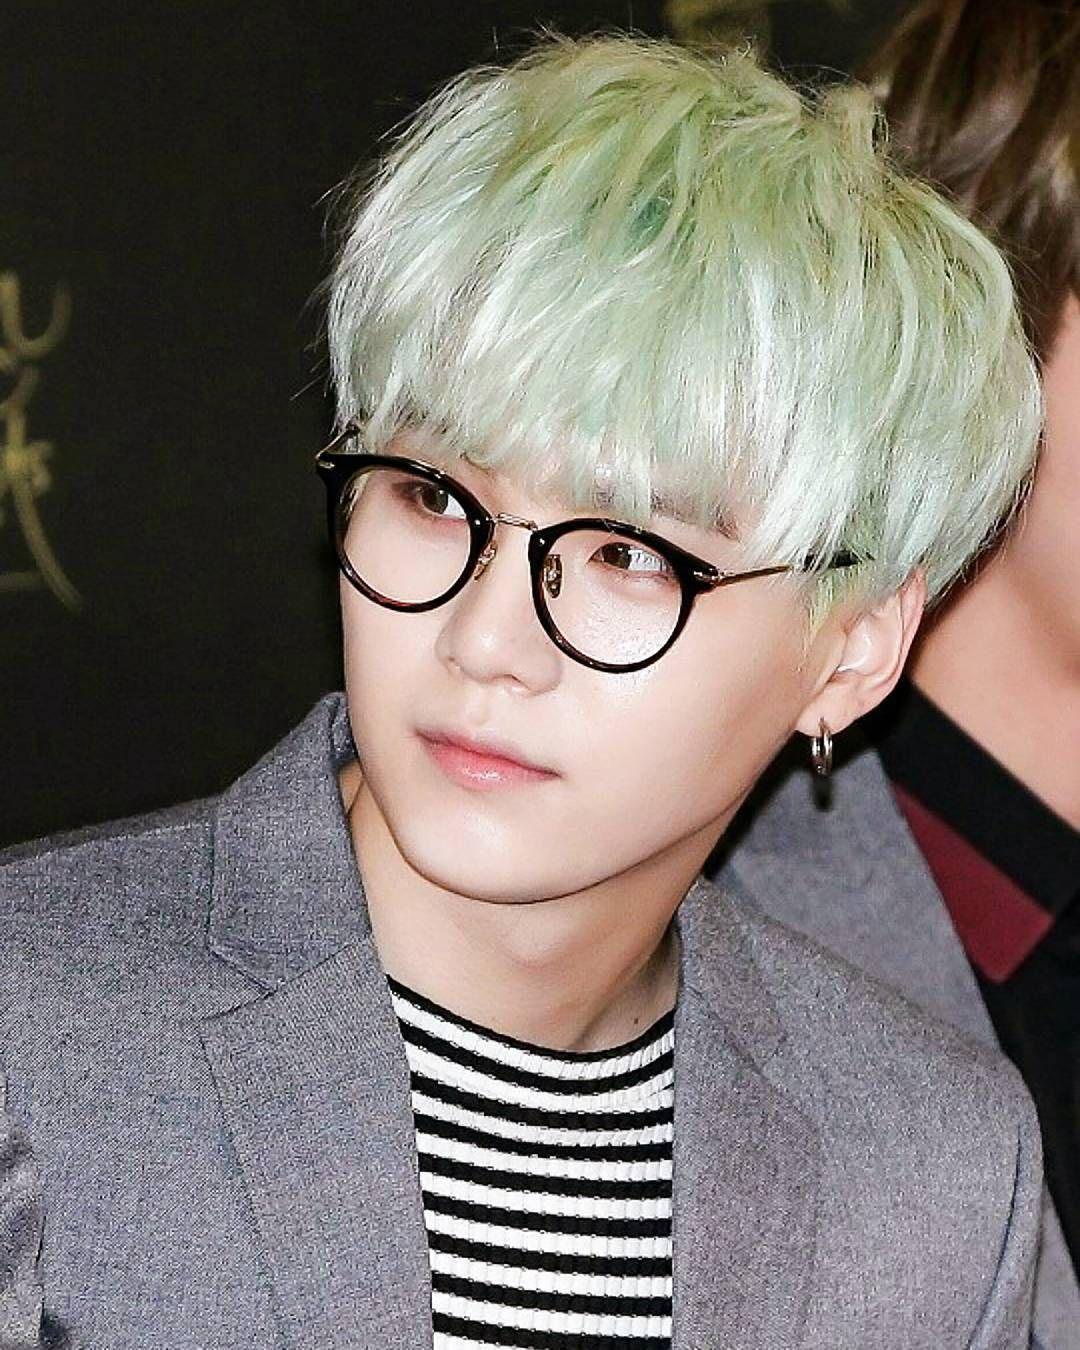 "21.2k Likes, 124 Comments - SUGA | AgustD | 비티에스 슈가 (@bts.suga) on Instagram: ""min suga genius jjang jjang man boong boong 👓 // I realised that my followers are not so active rn…"""